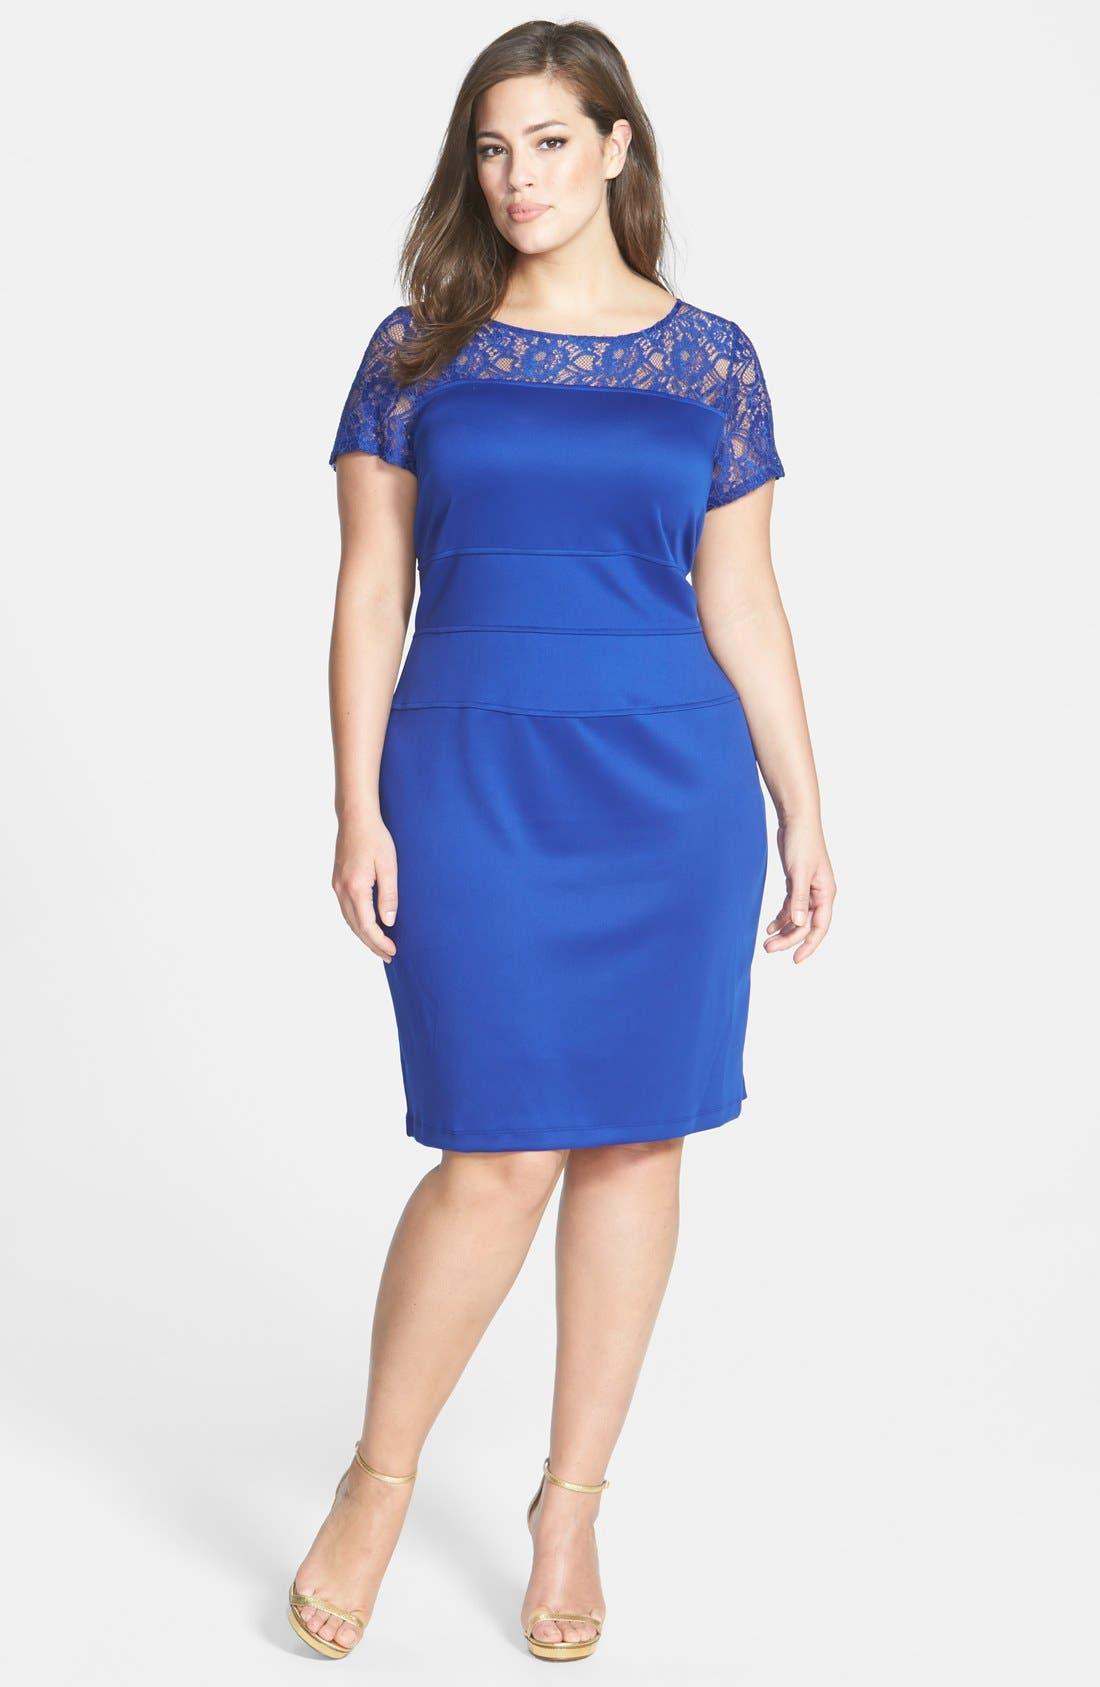 Alternate Image 1 Selected - Gabby Skye Lace Yoke Sheath Dress (Plus Size)